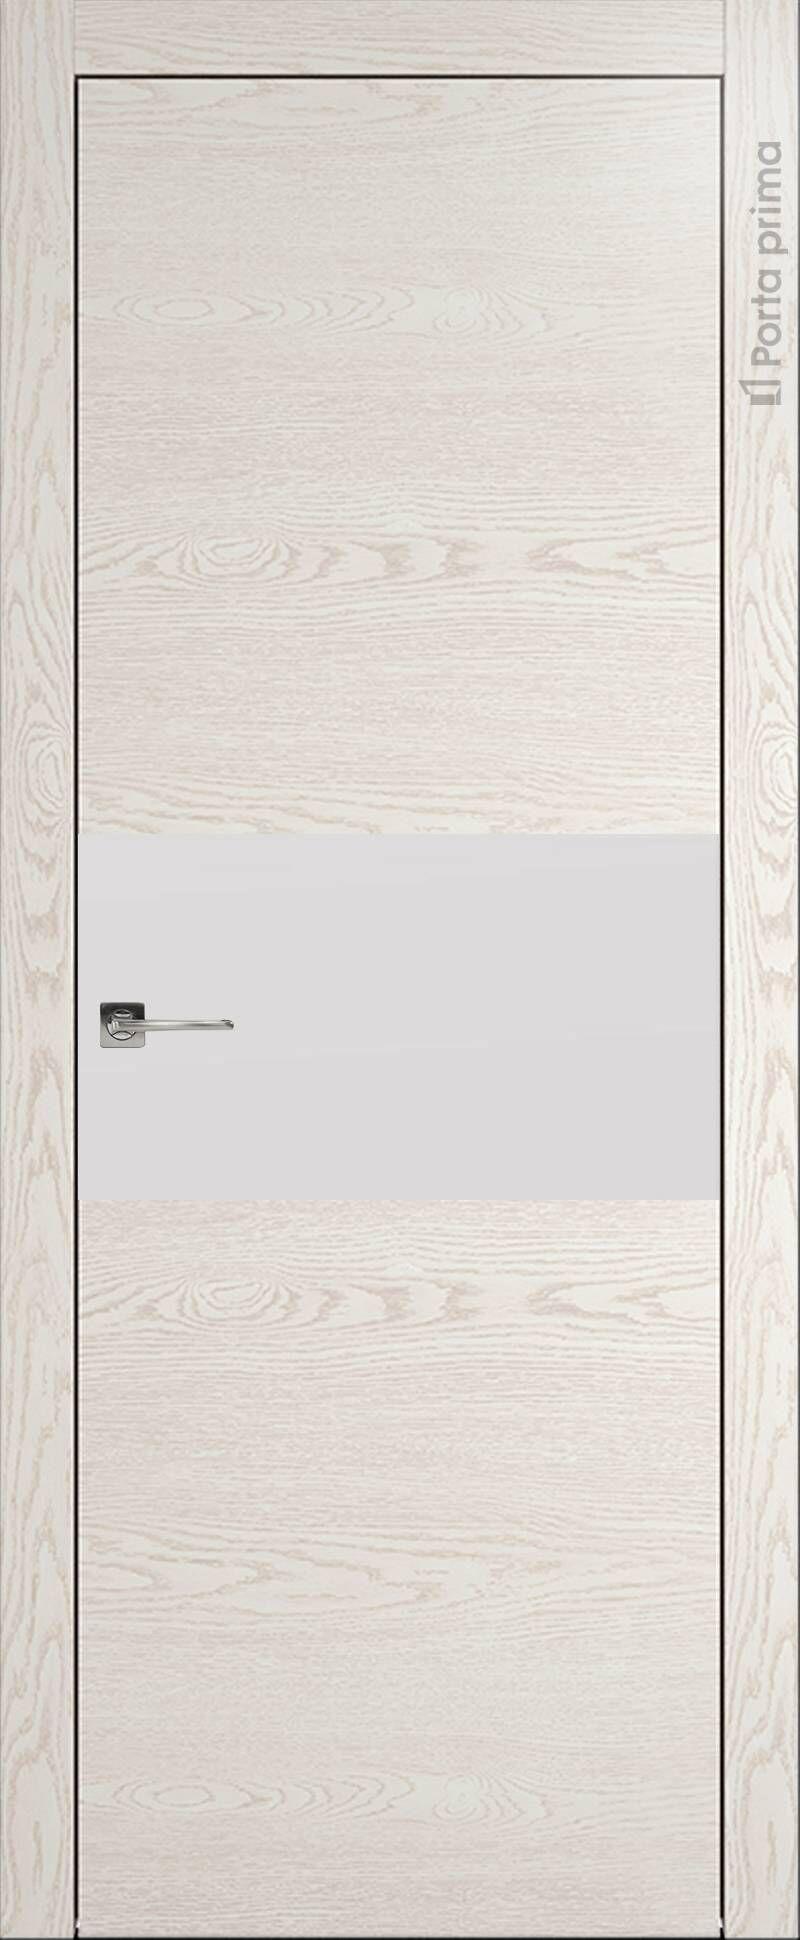 Tivoli Е-4 цвет - Белый ясень (nano-flex) Без стекла (ДГ)